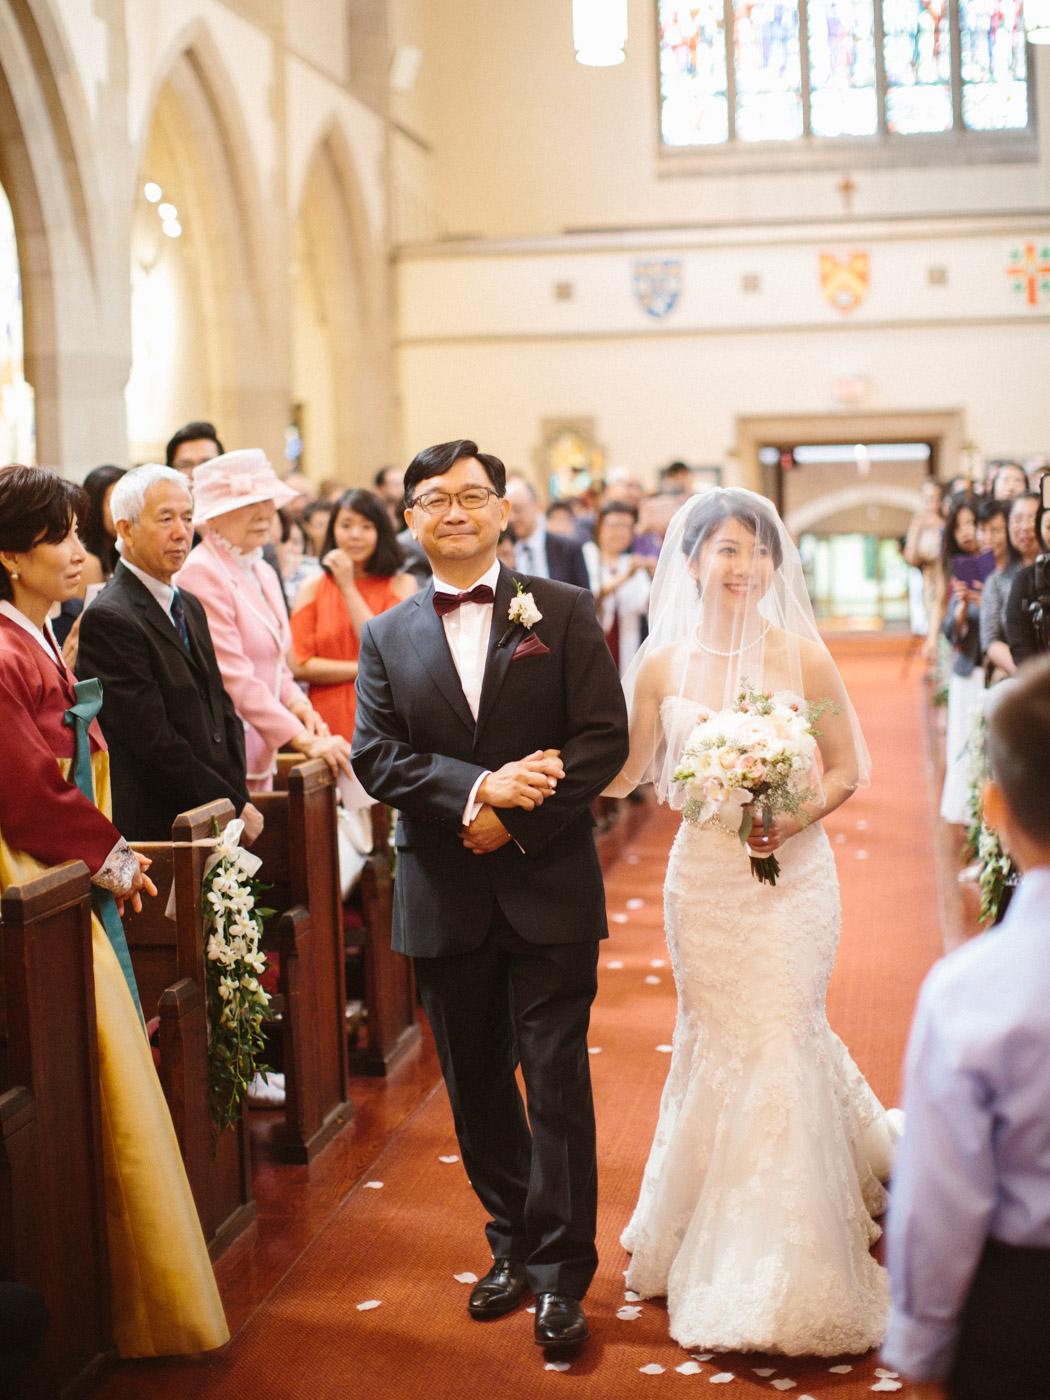 toronto_wedding_photographer_fine_art_documentary_photography-64.jpg